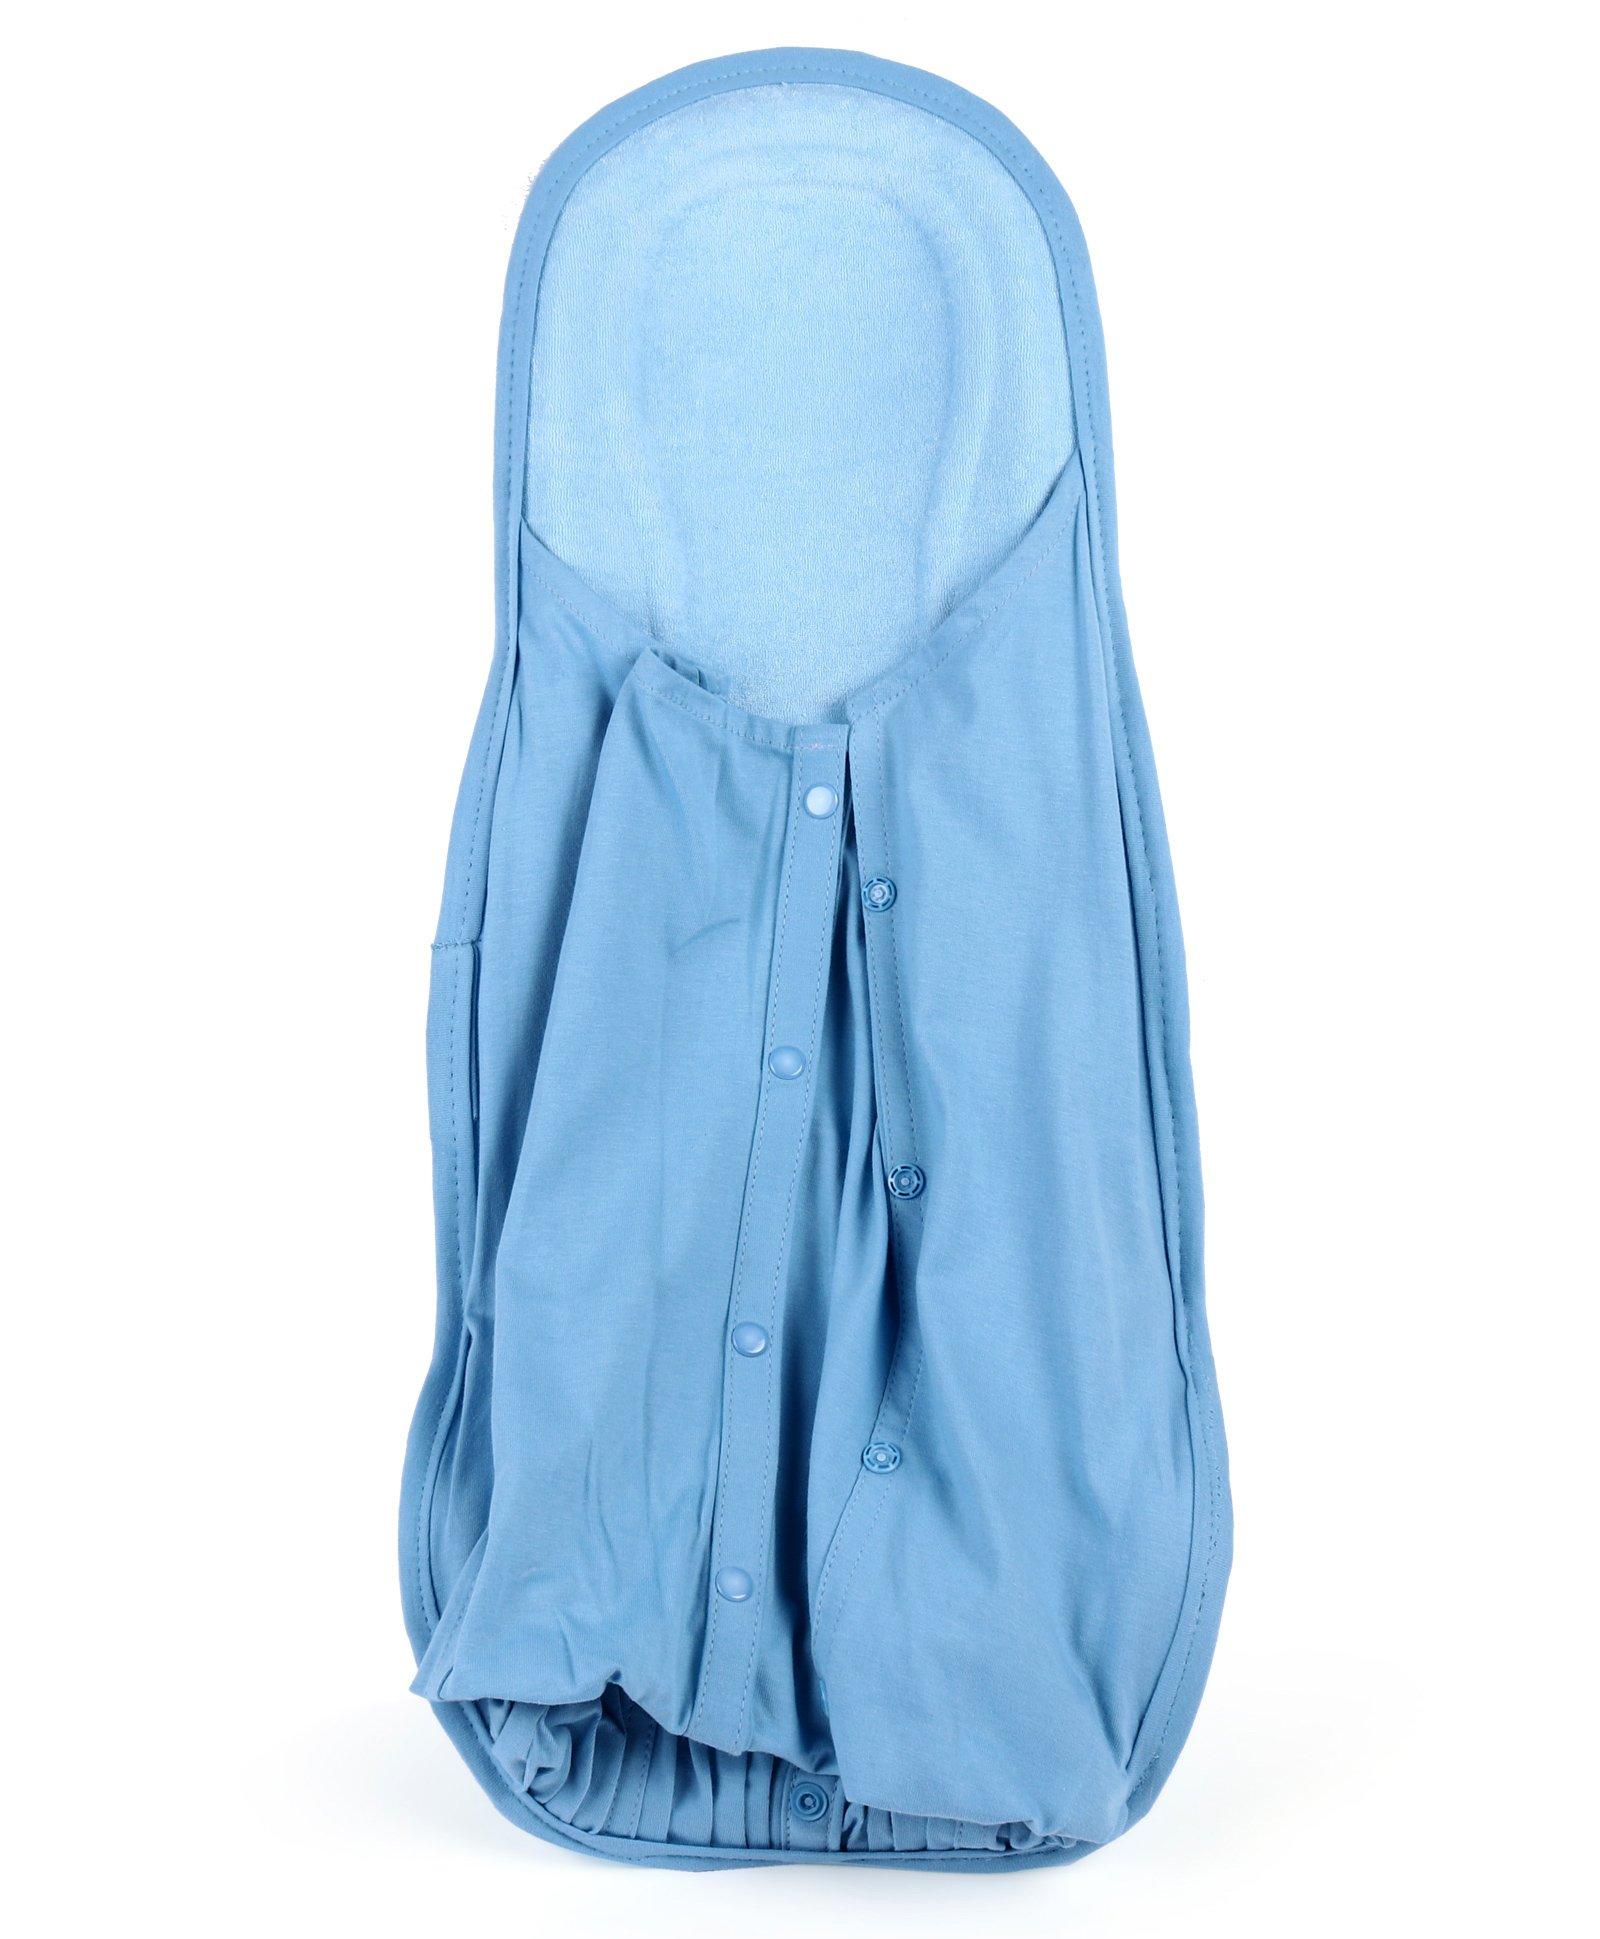 Baby Kare Hoopa Hooded Infant Carrier - Blue